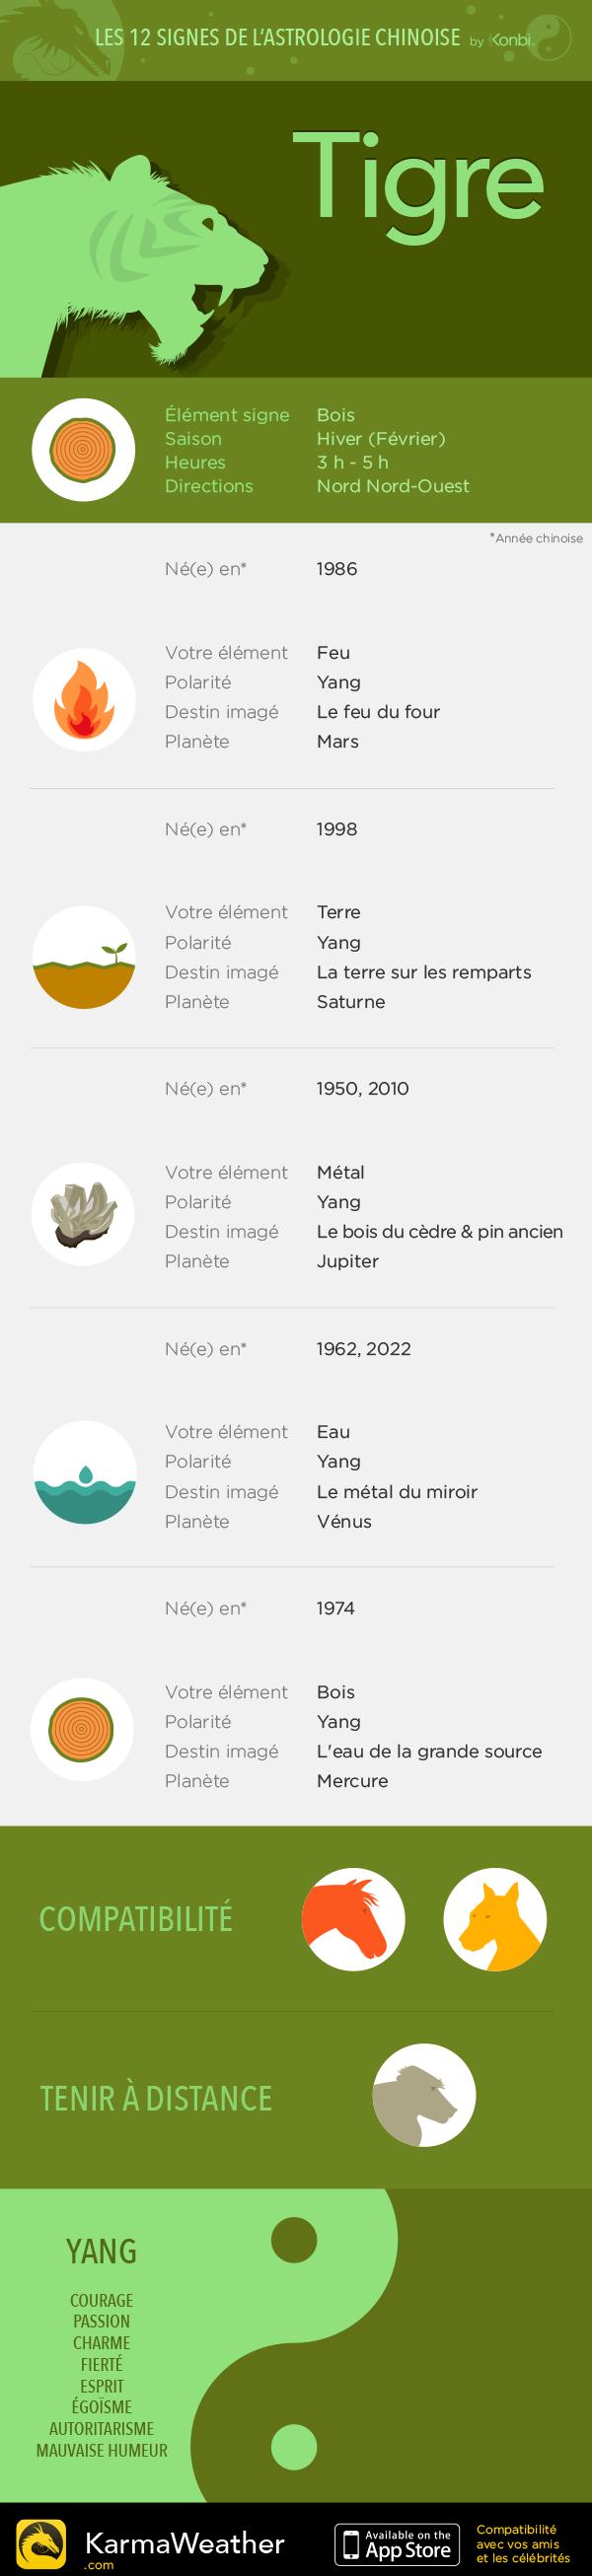 Horoscope des 12 signes du zodiaque chinois : le Tigre